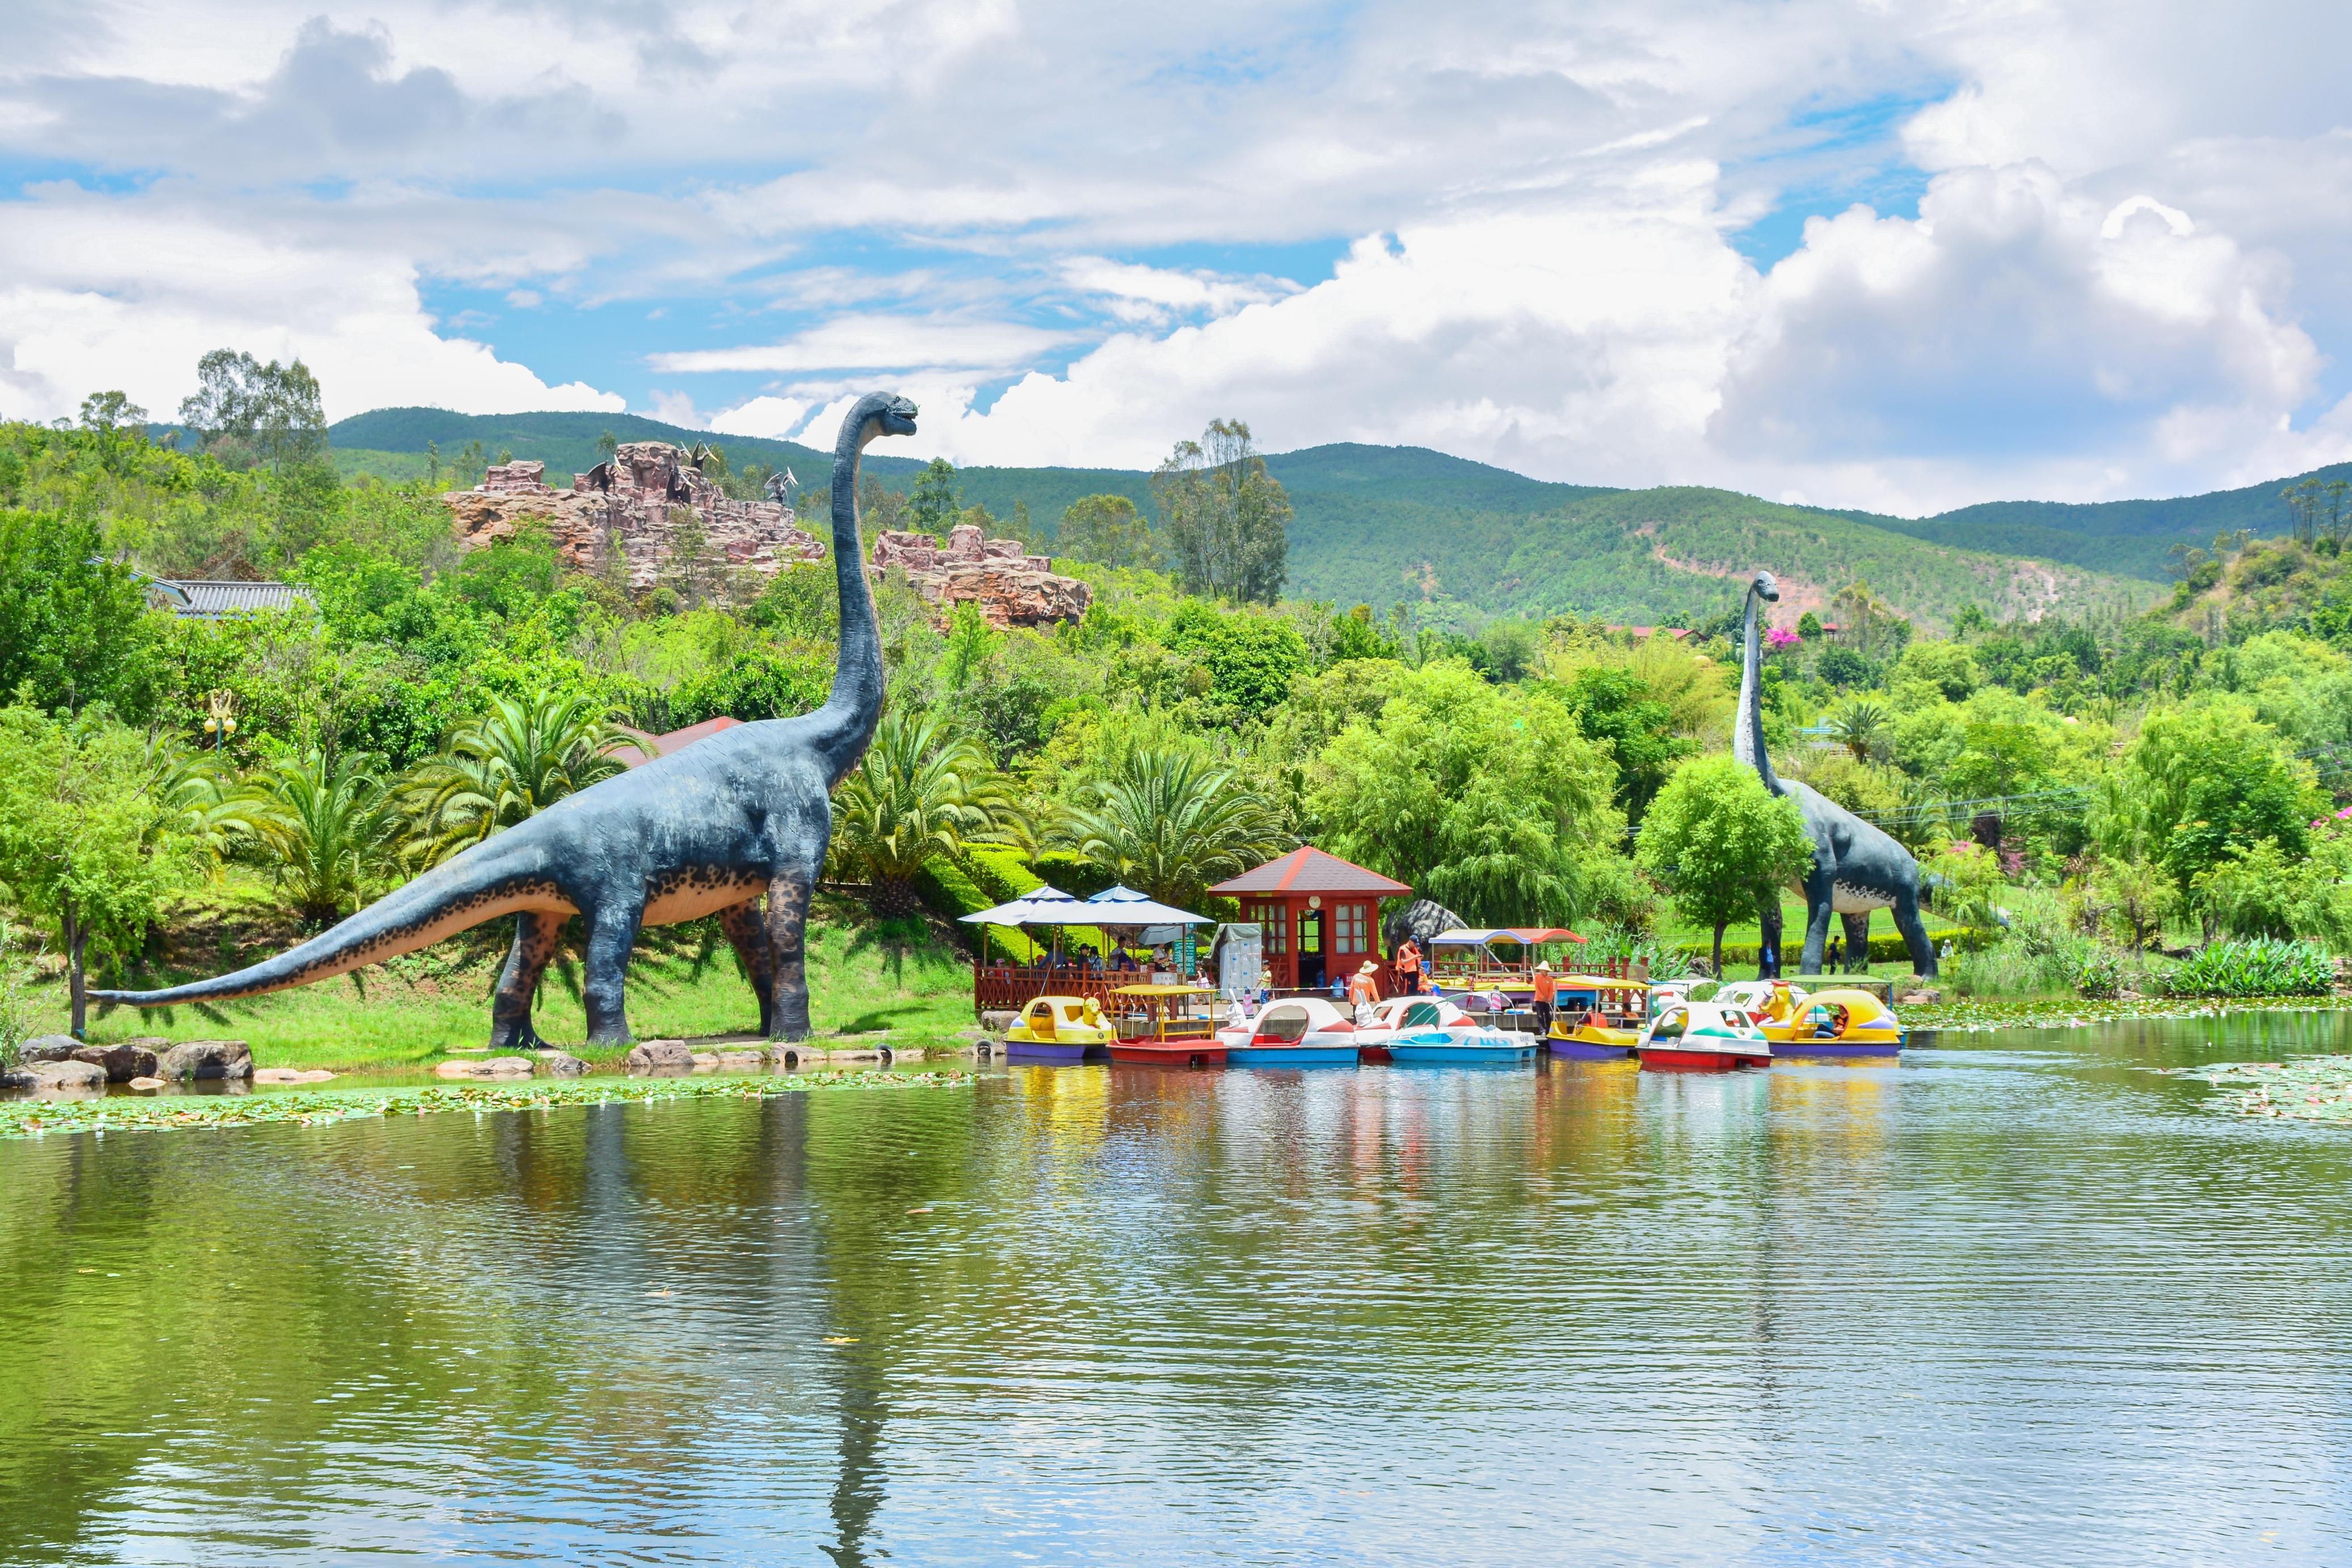 Lufeng World Dinosaur Valley